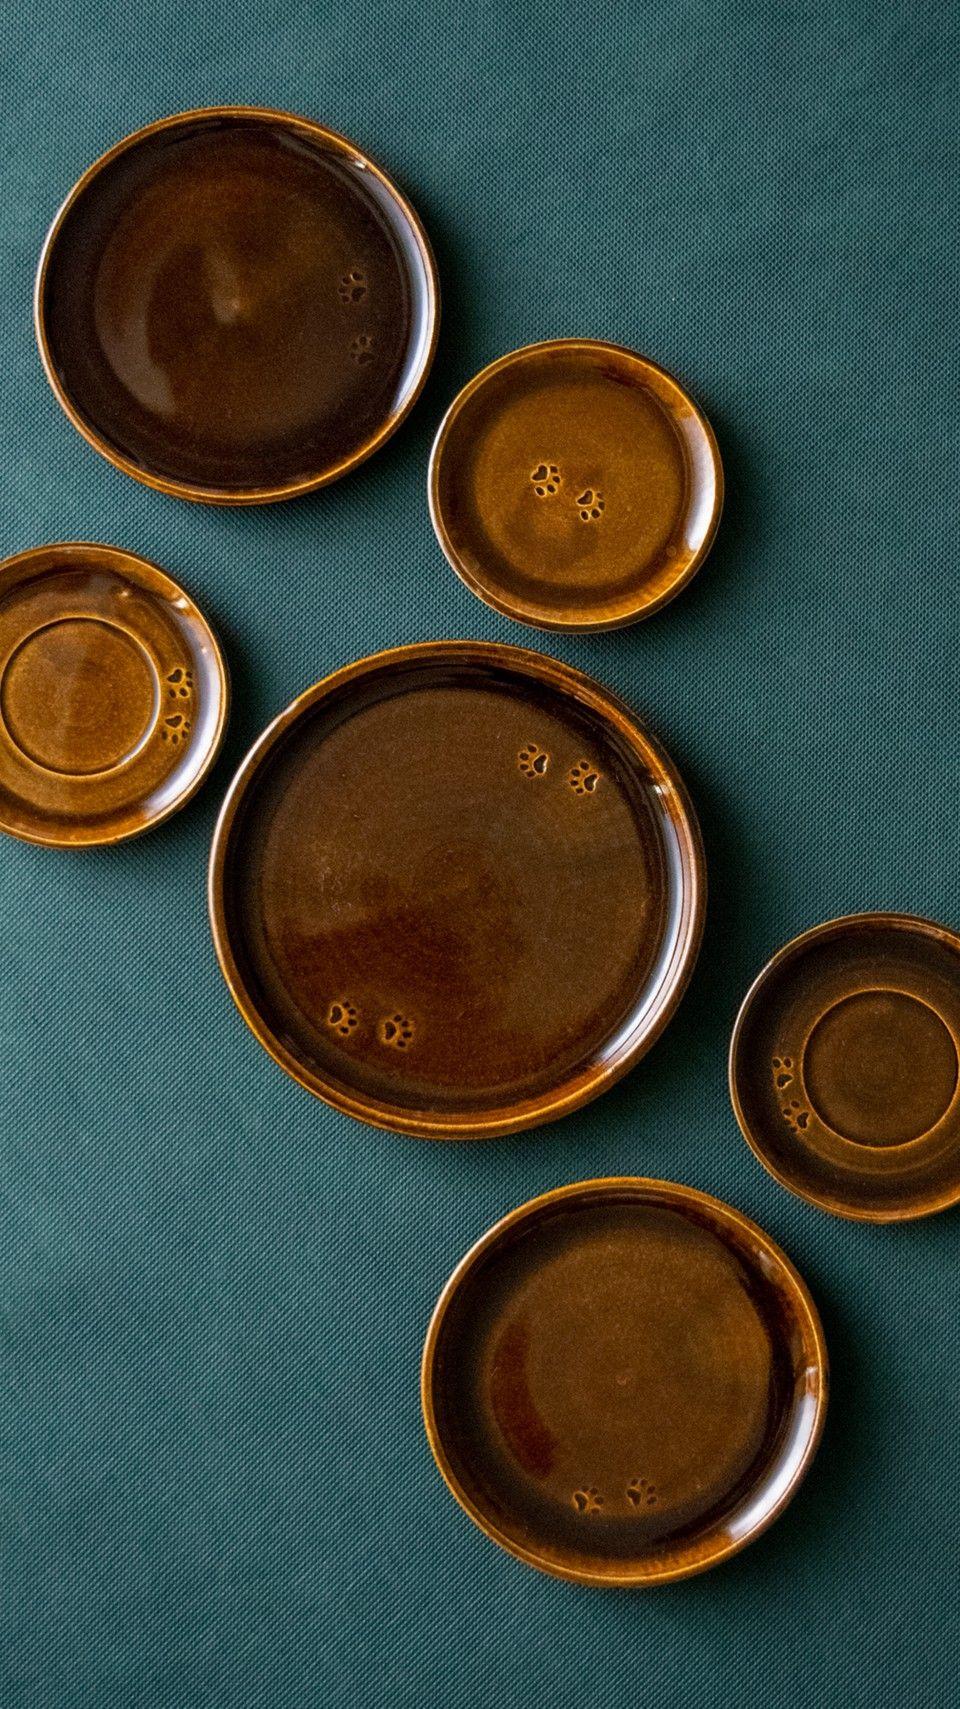 #handmadeceramics #pottery #poterie #keramik #clayart  #kitchenaccessories #handmade #wheelthrown #potteryplates #ceramics #ceramiclove   #instapottery #homeaccents #gres #claylove #kitchenware #cadeauorginal #gosha_ceramics #tableware #céramique #homedecor #decorationmaison  #ilovepottery #assiettes #potterylover #homedecor  #giftidea #interiordeco #funcionalpottery #brownplates